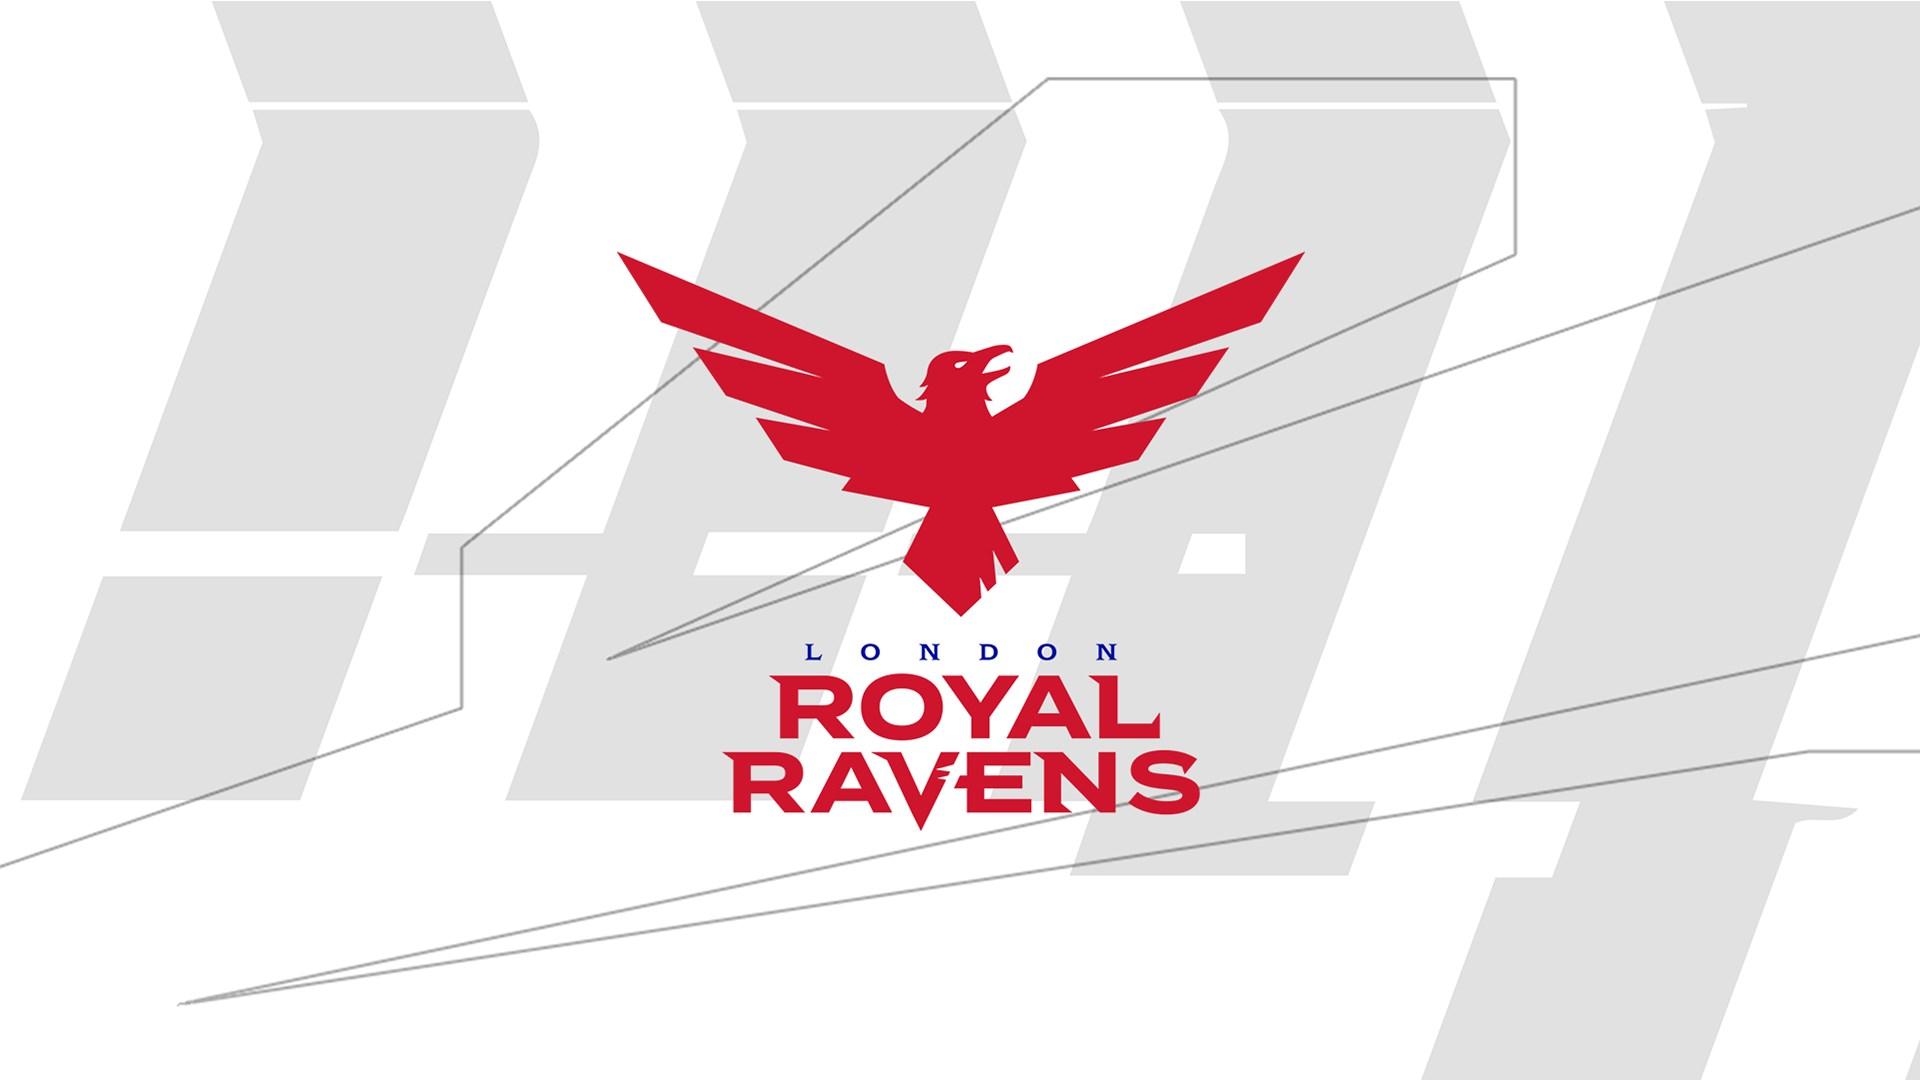 Call of Duty League™ - London Royal Ravens Pack 2021